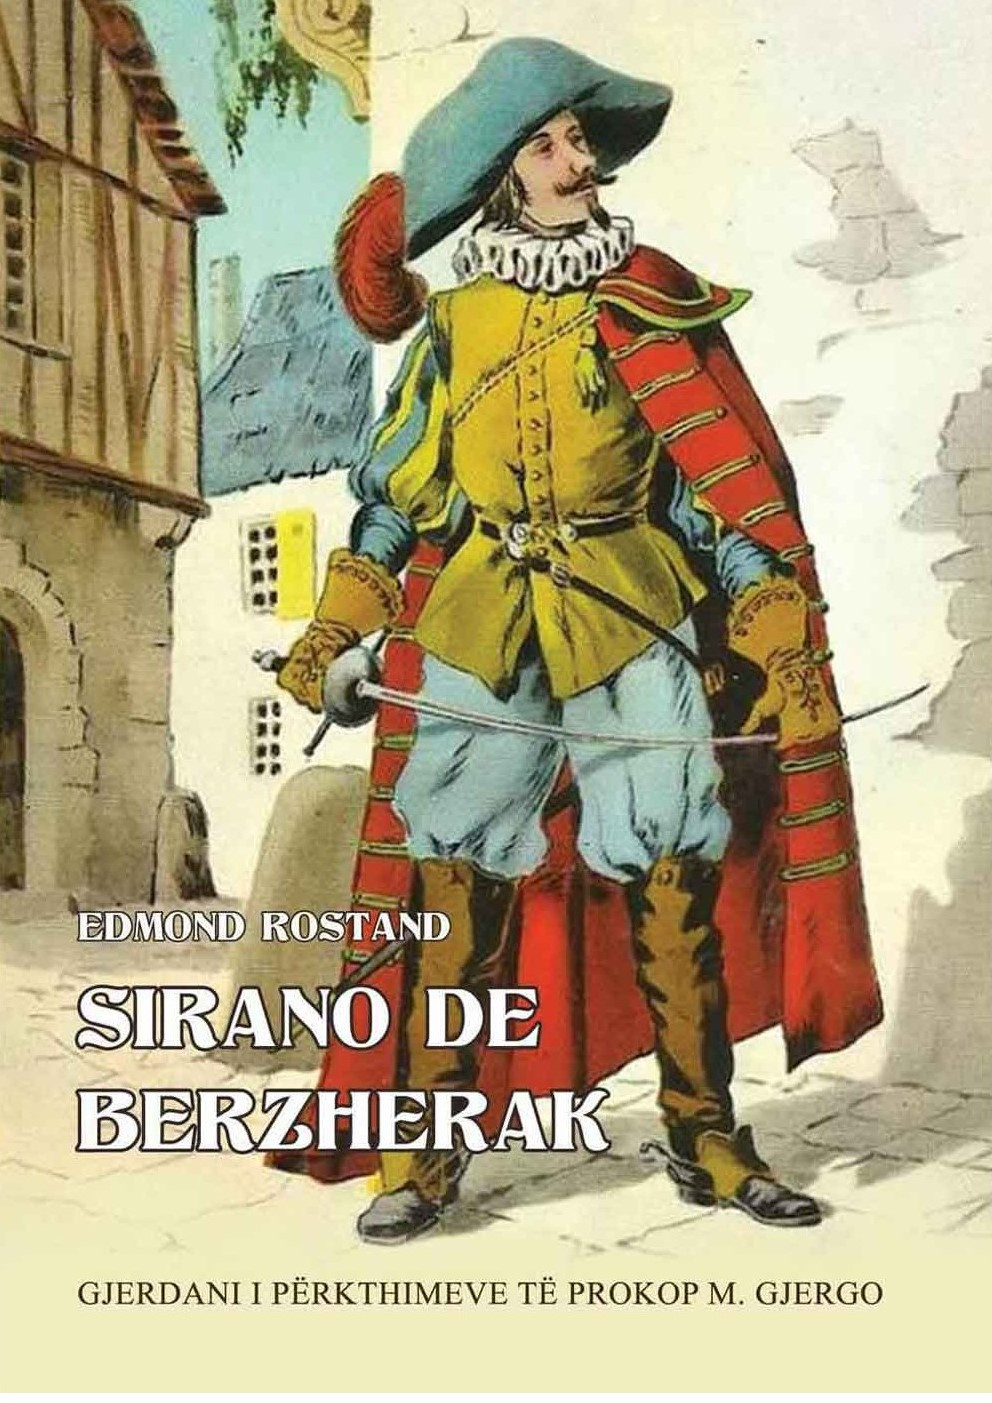 Sirano de Berzherak